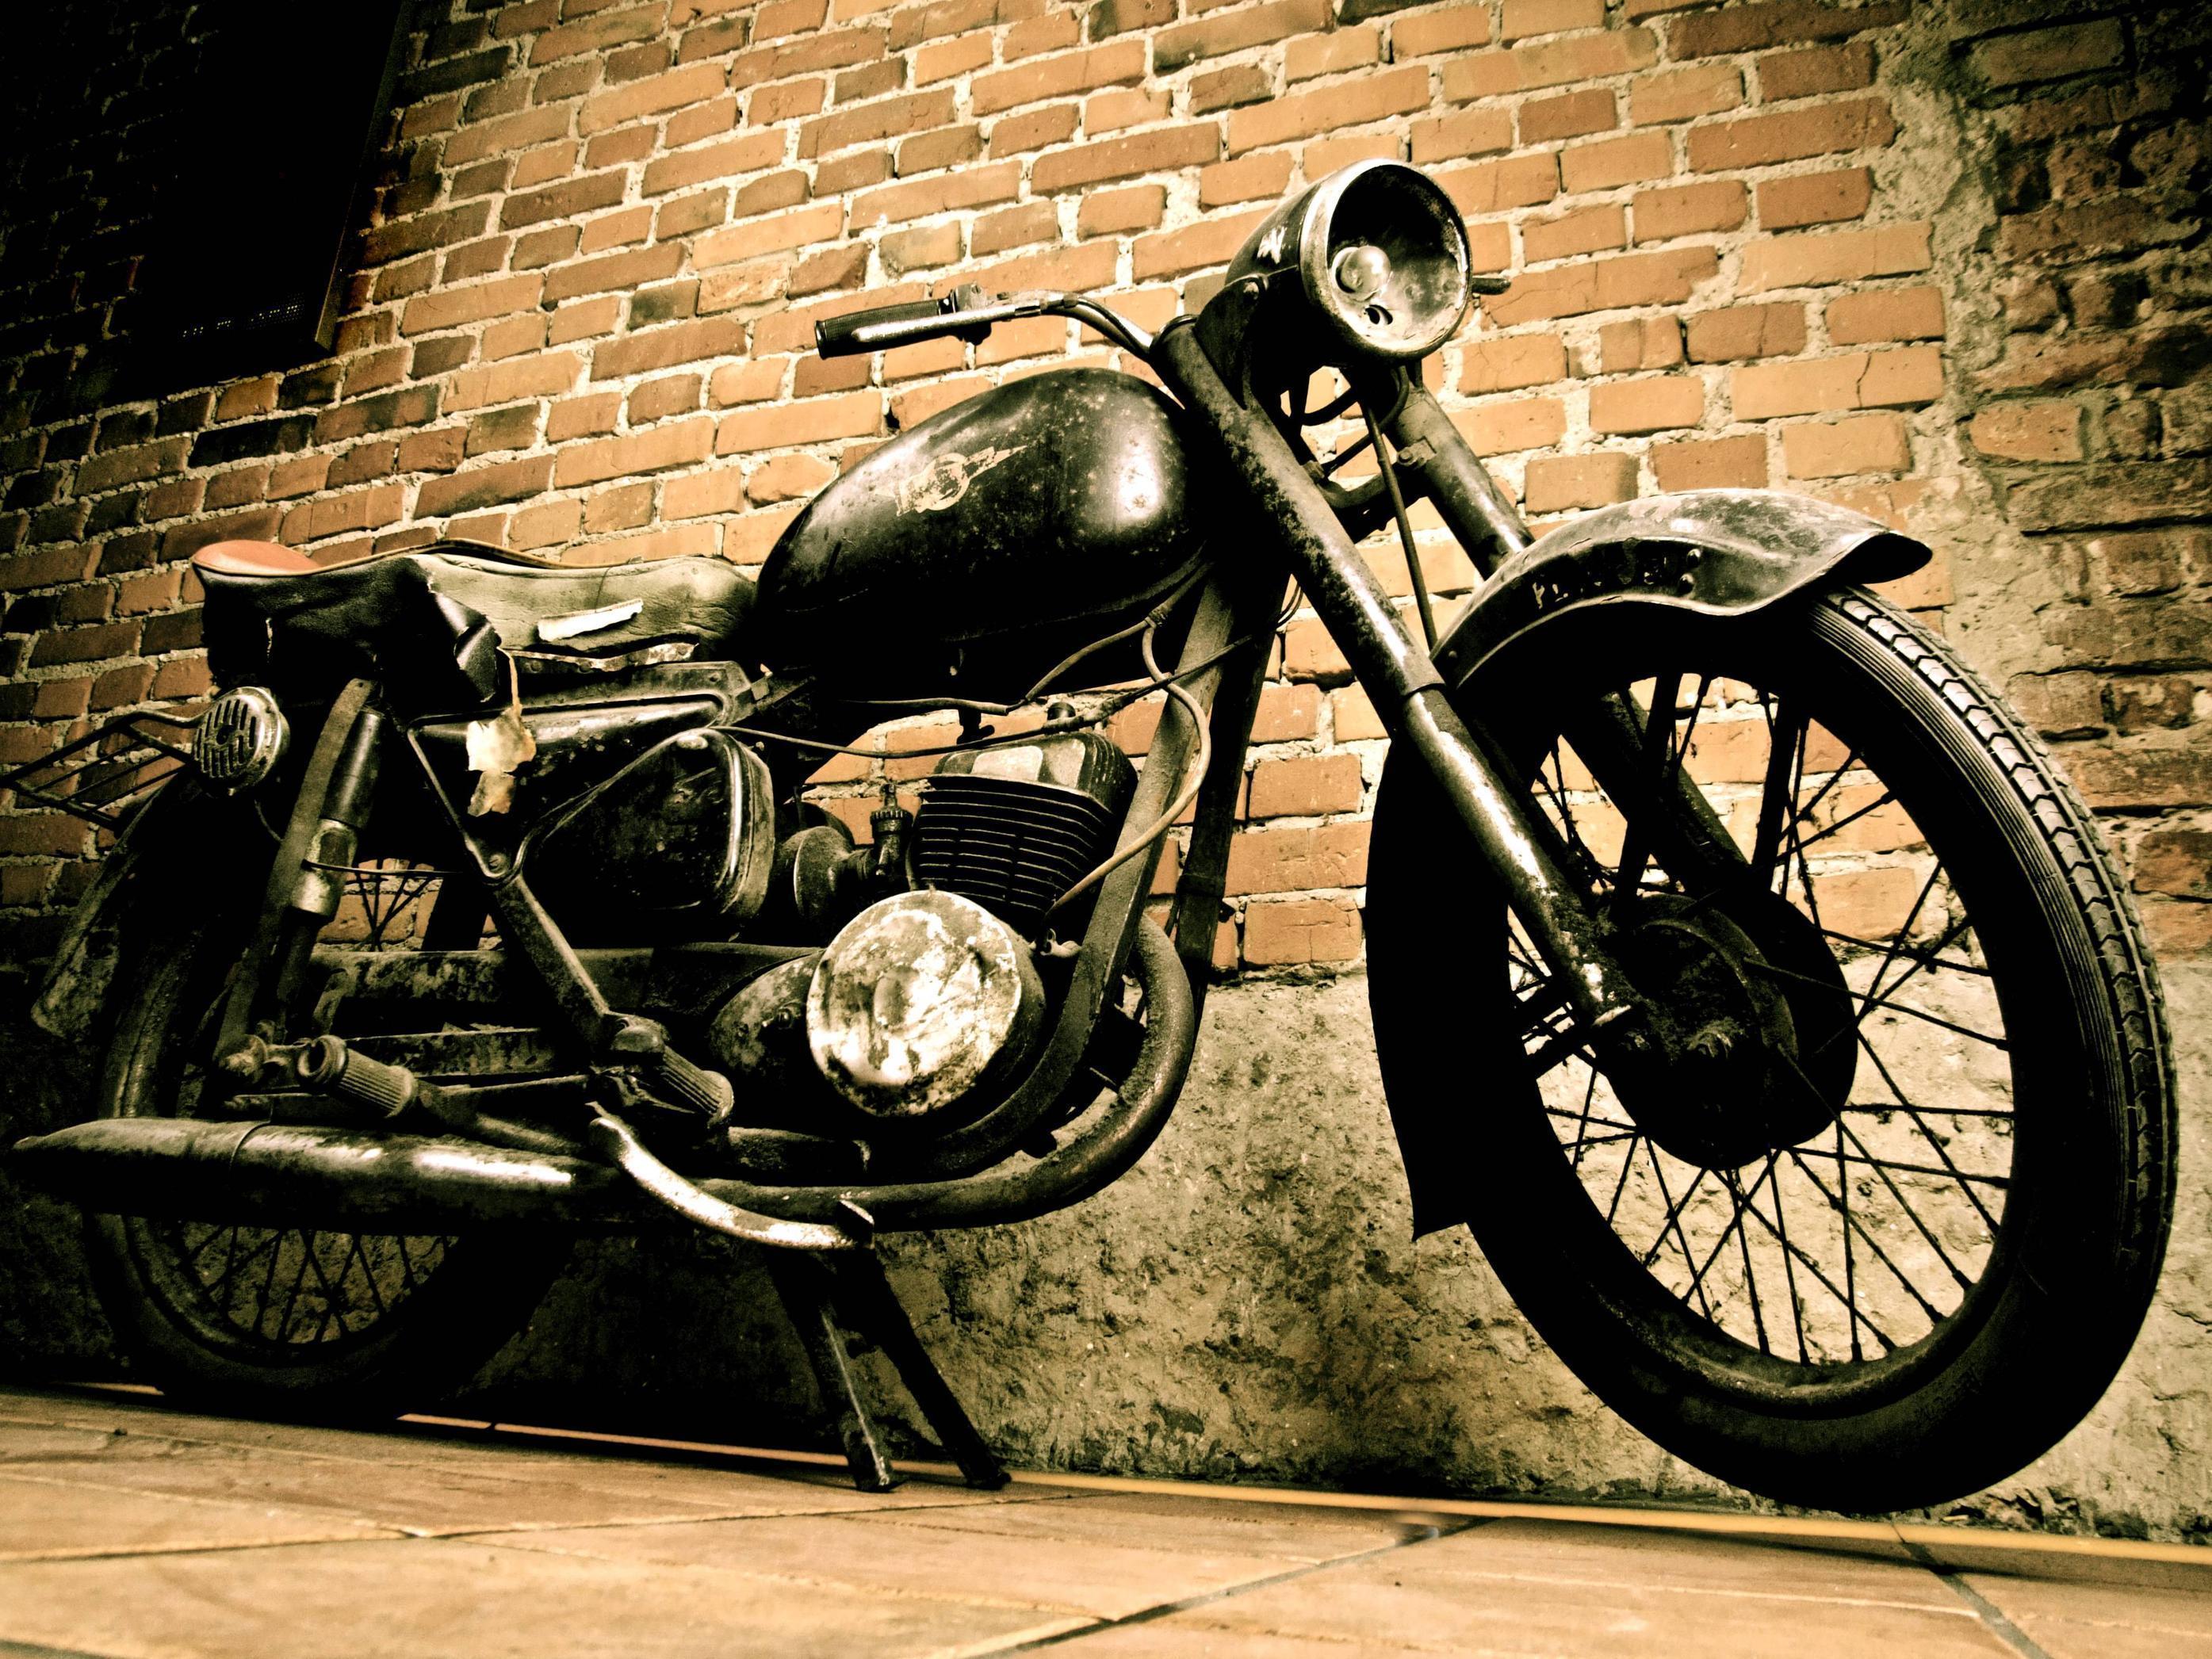 Картинка вместо номера на мотоцикл конце статьи